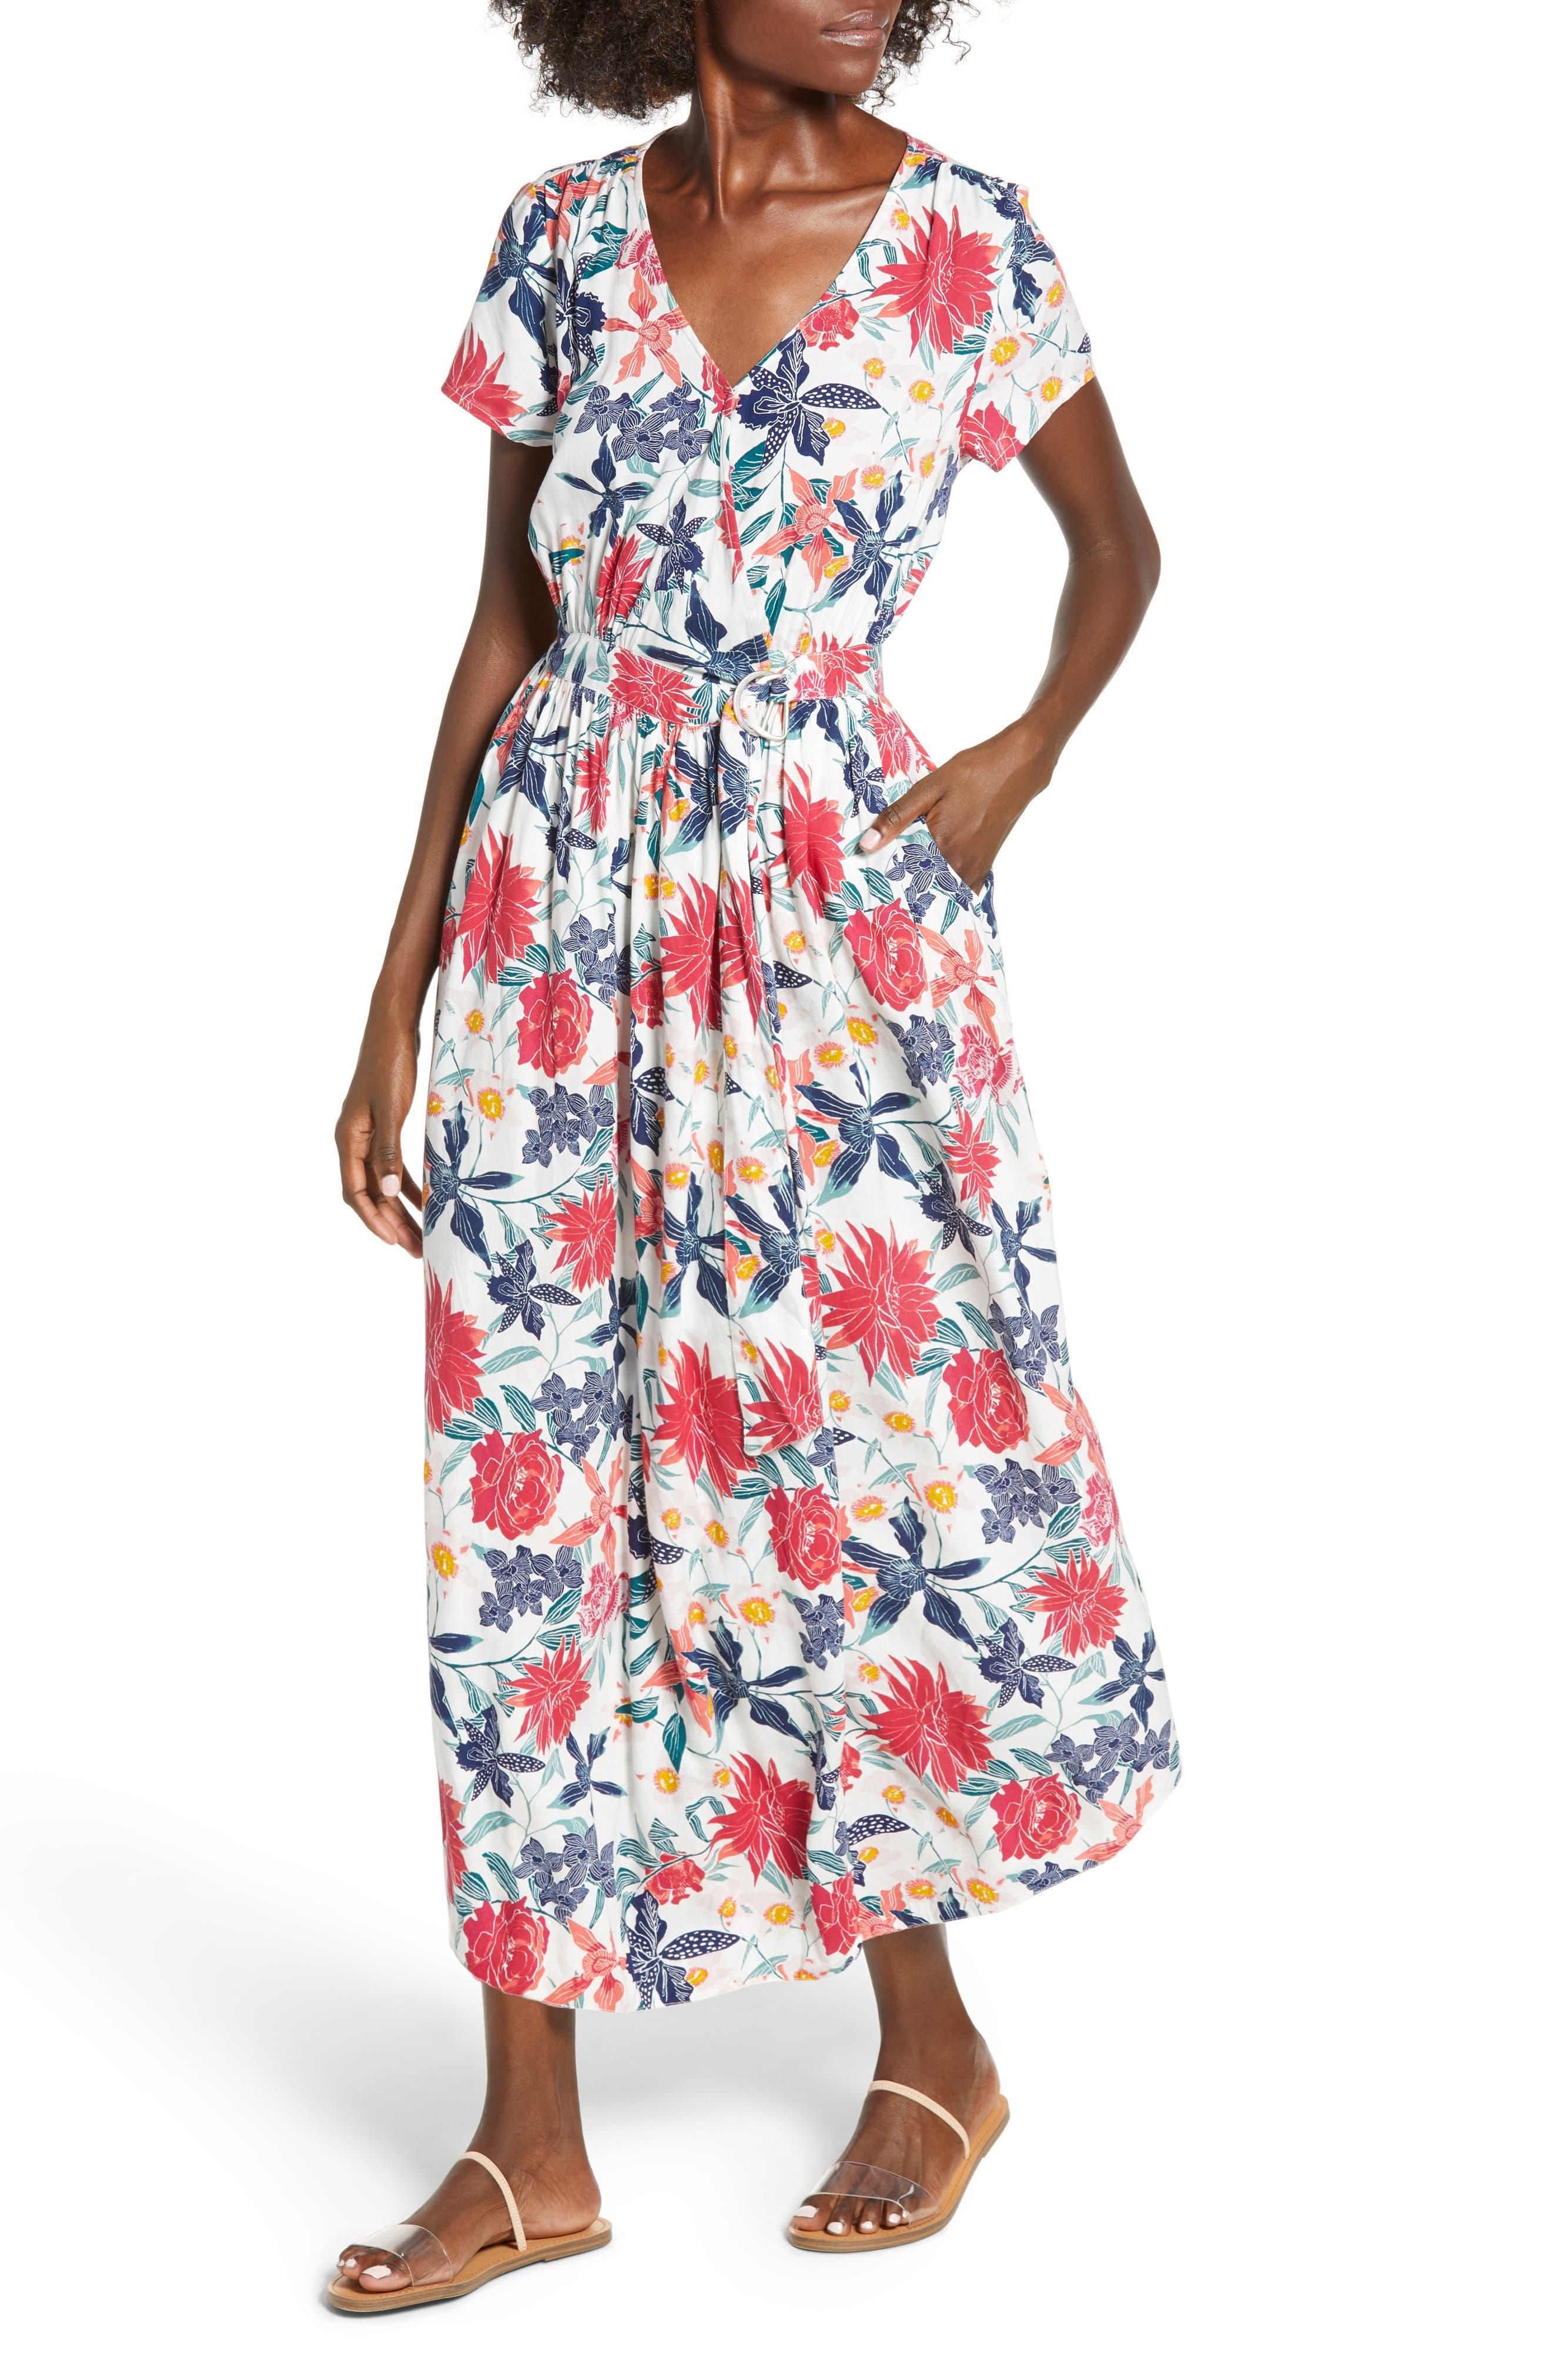 District Nights Floral Print Dress,                             Main thumbnail 1, color,                             MARSHMALLOW TALLOWS